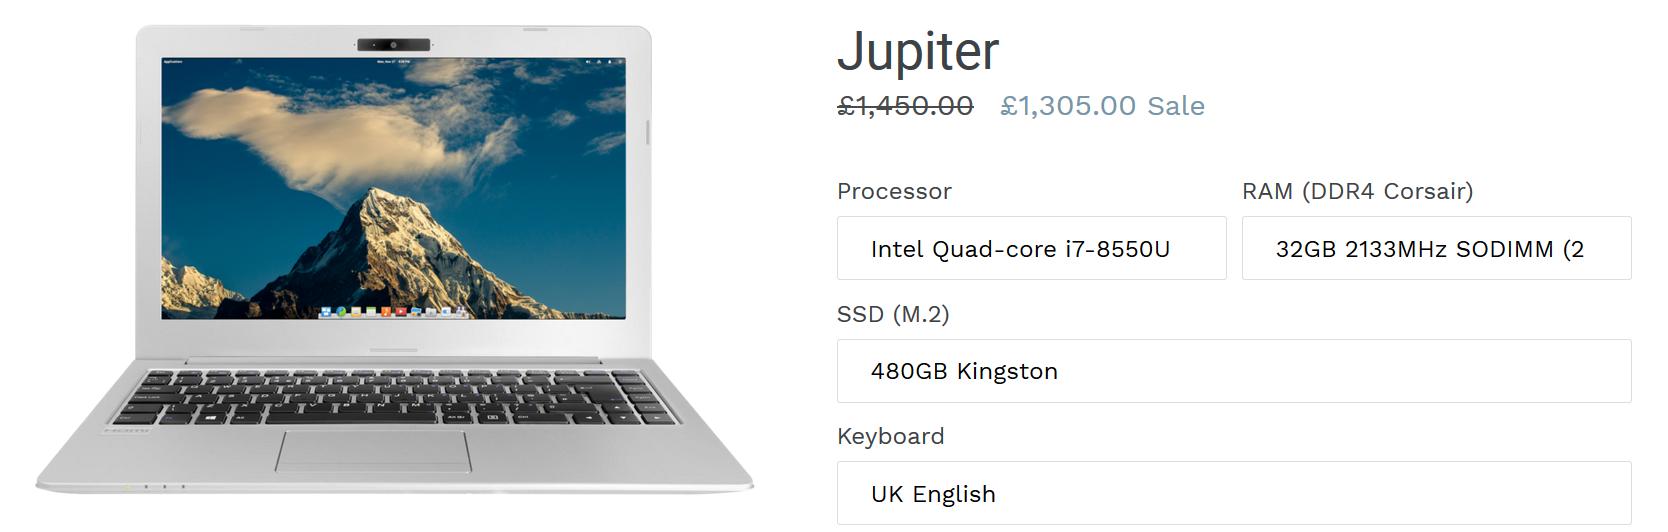 Jupiter - Juno Computers